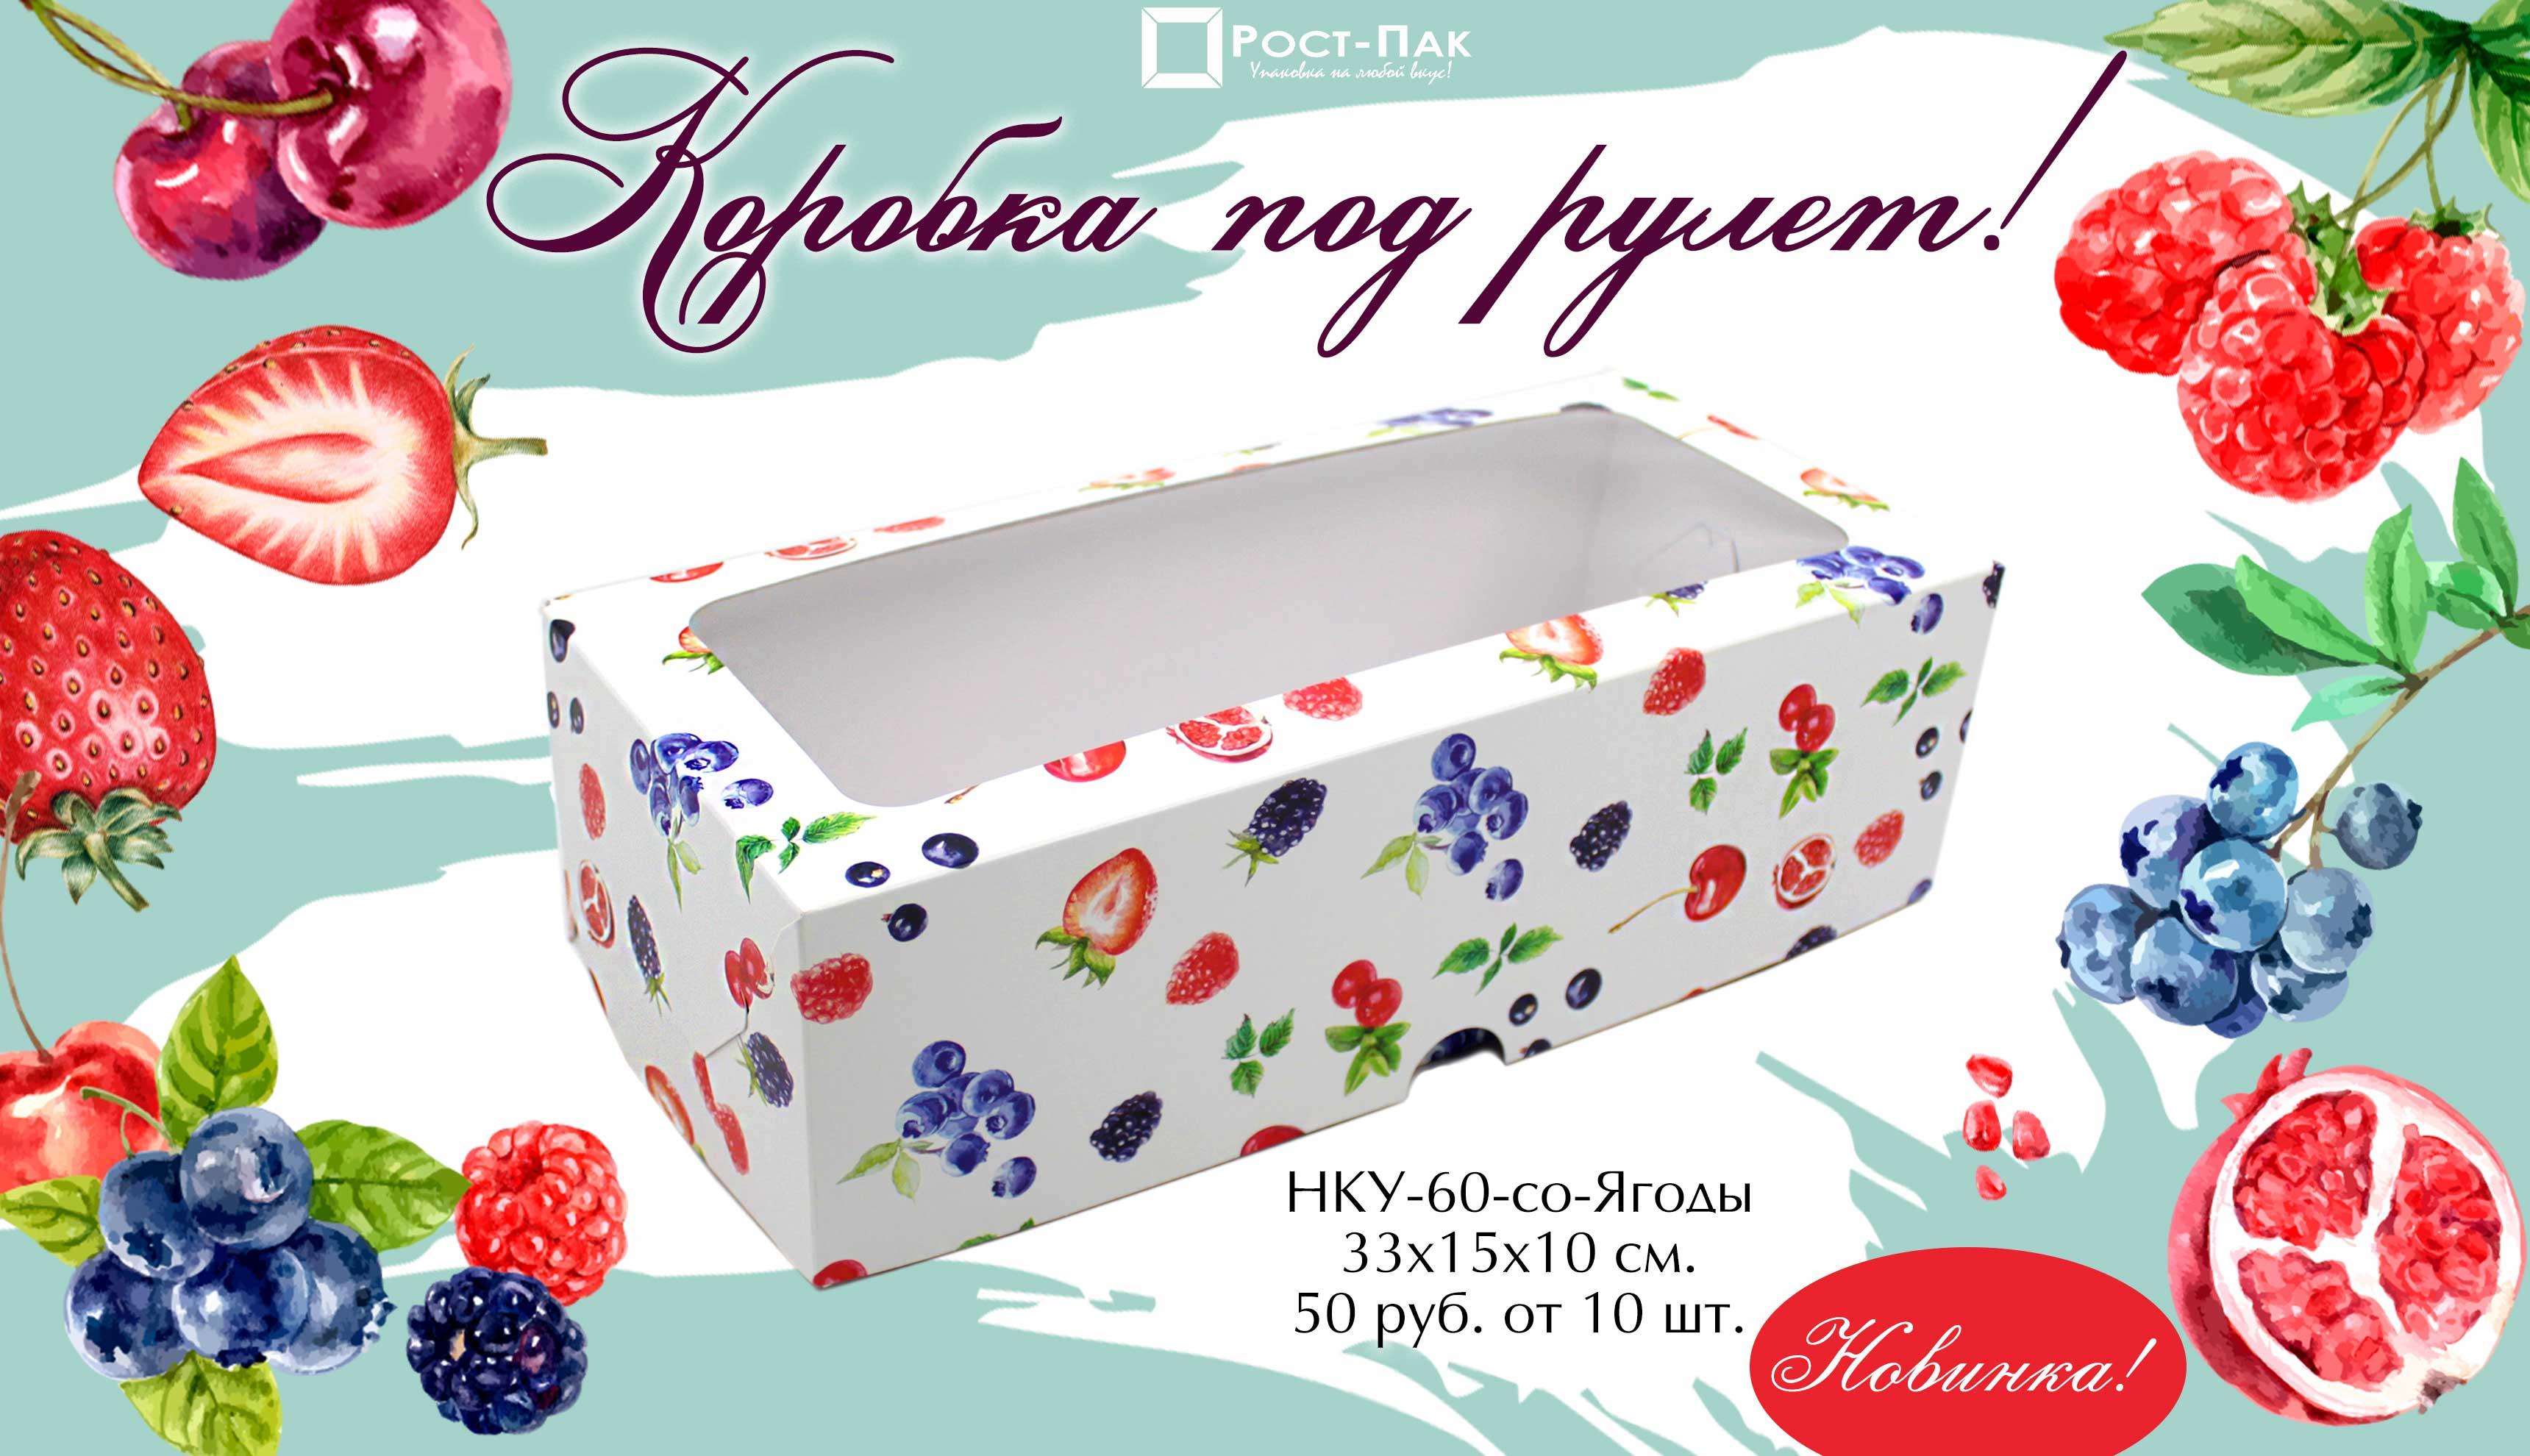 НКУ-60-со-Ягоды